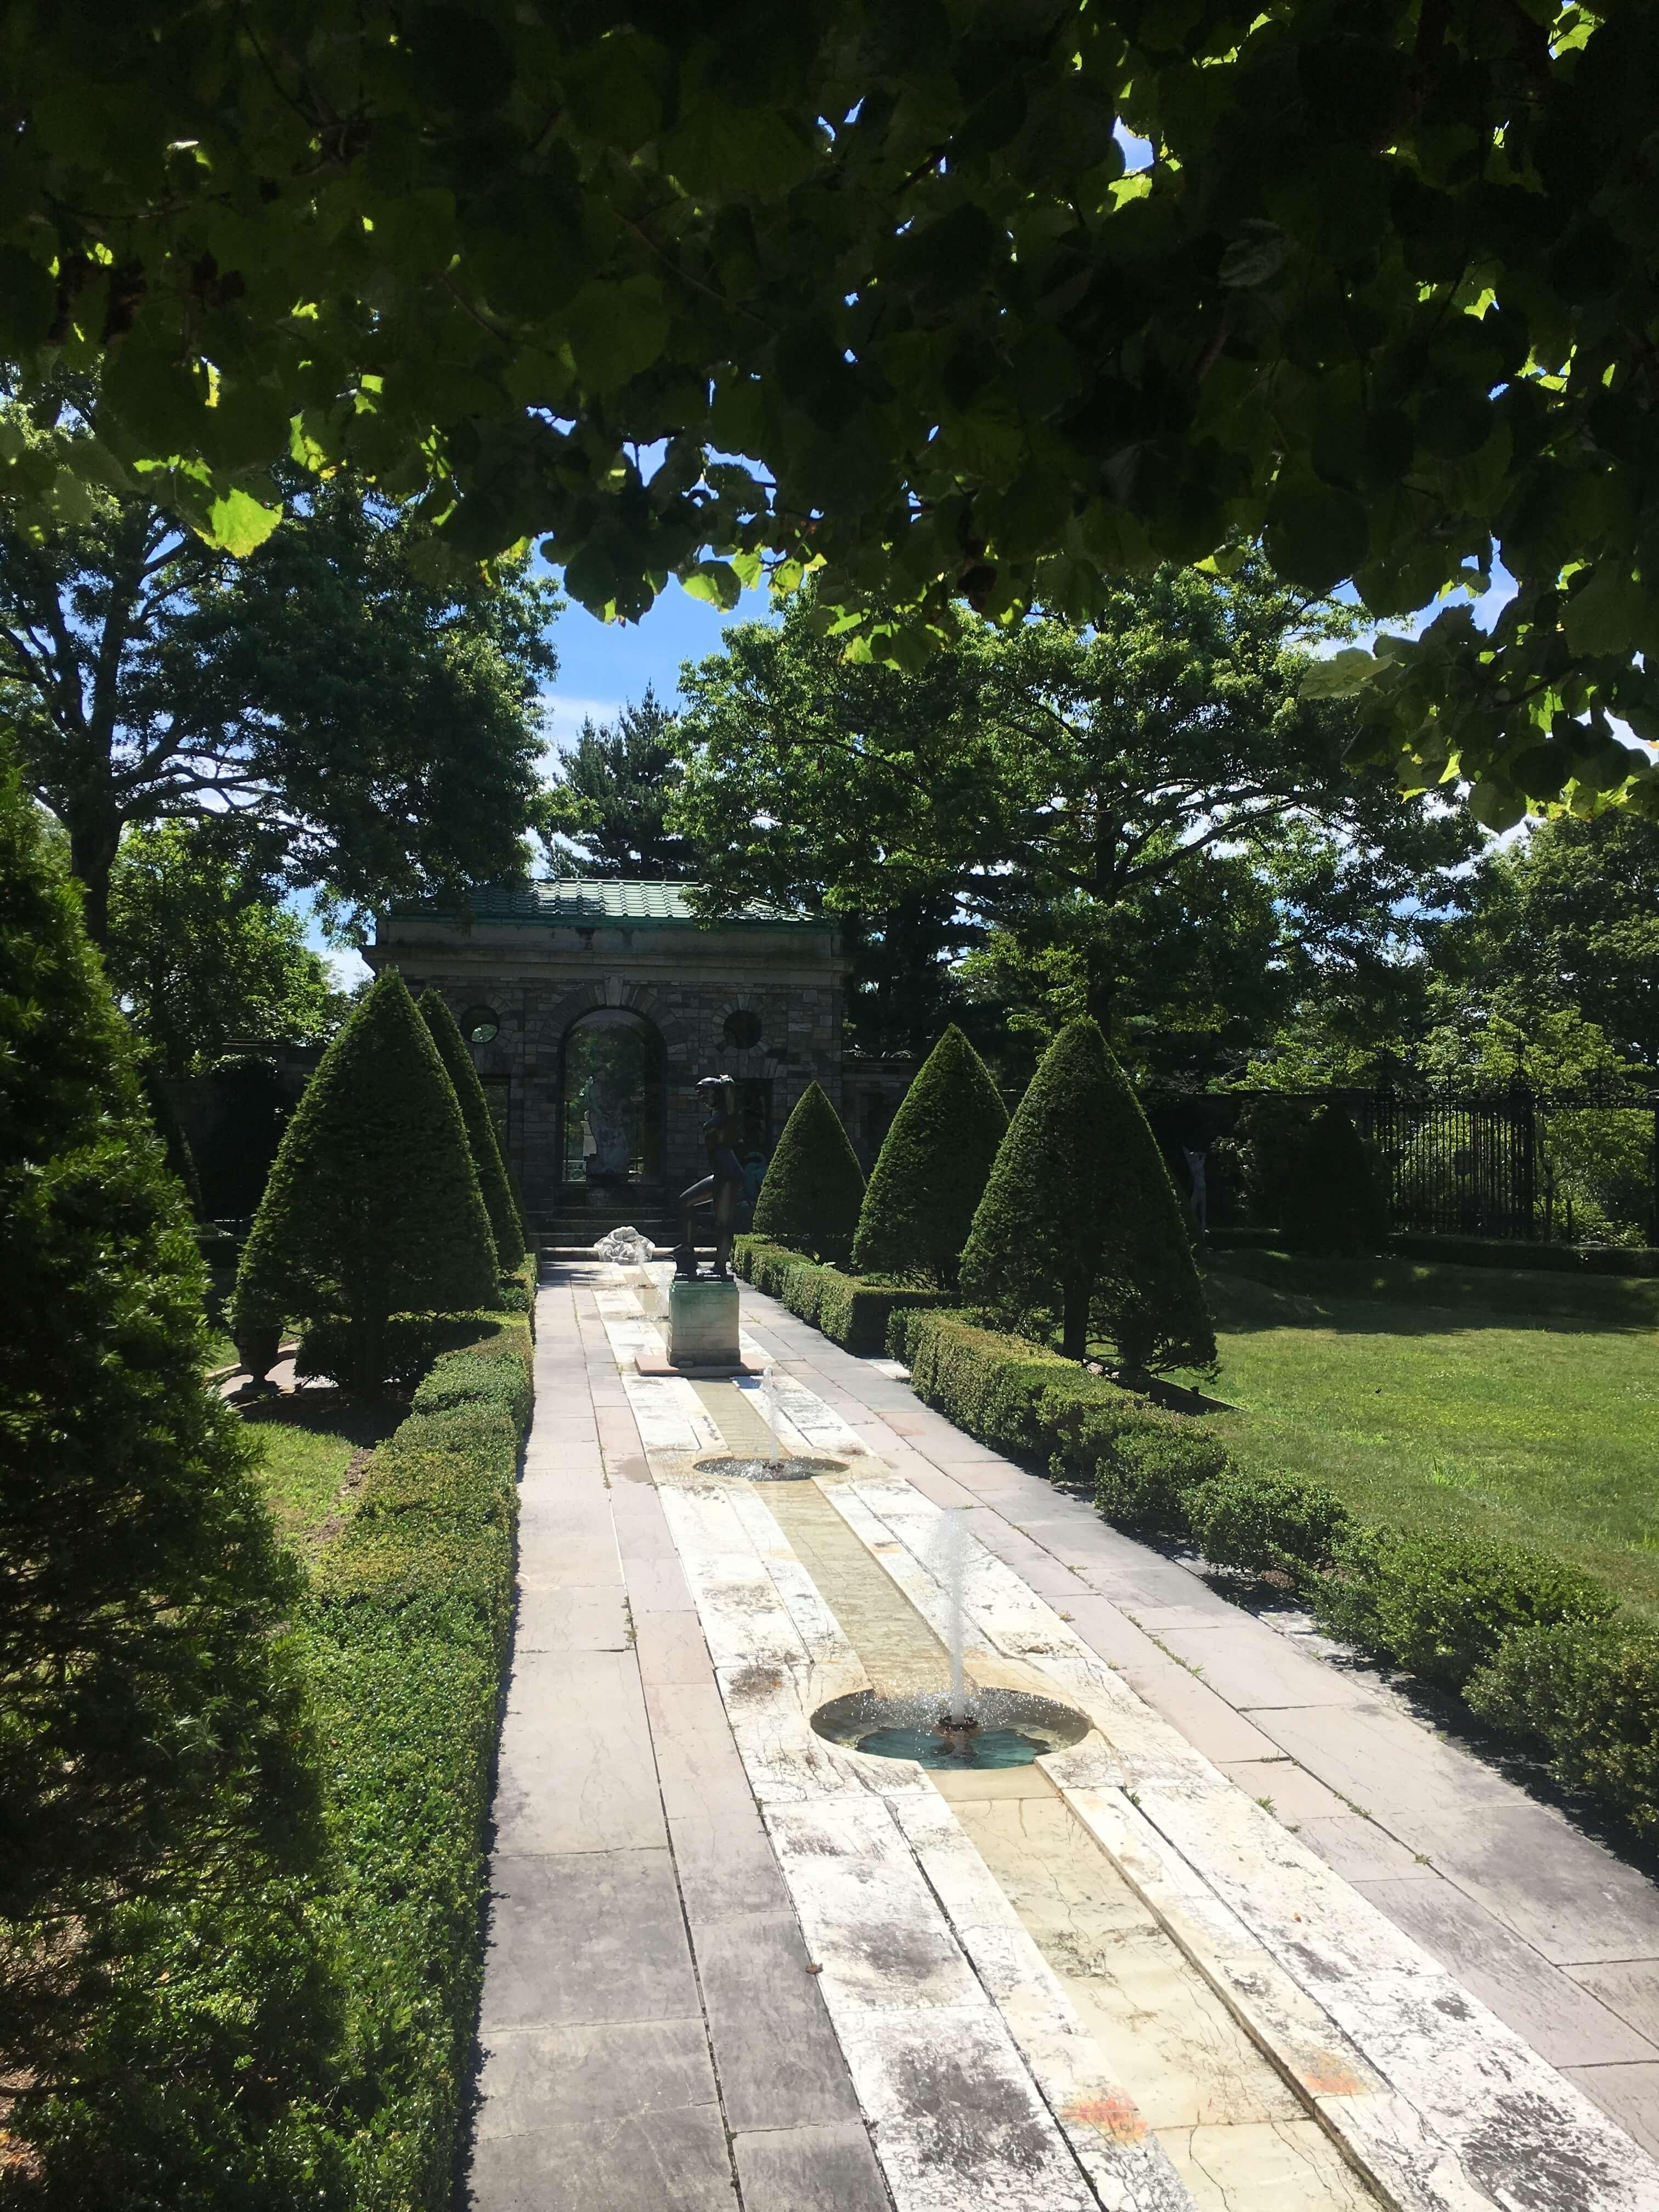 kykuit estate greenery